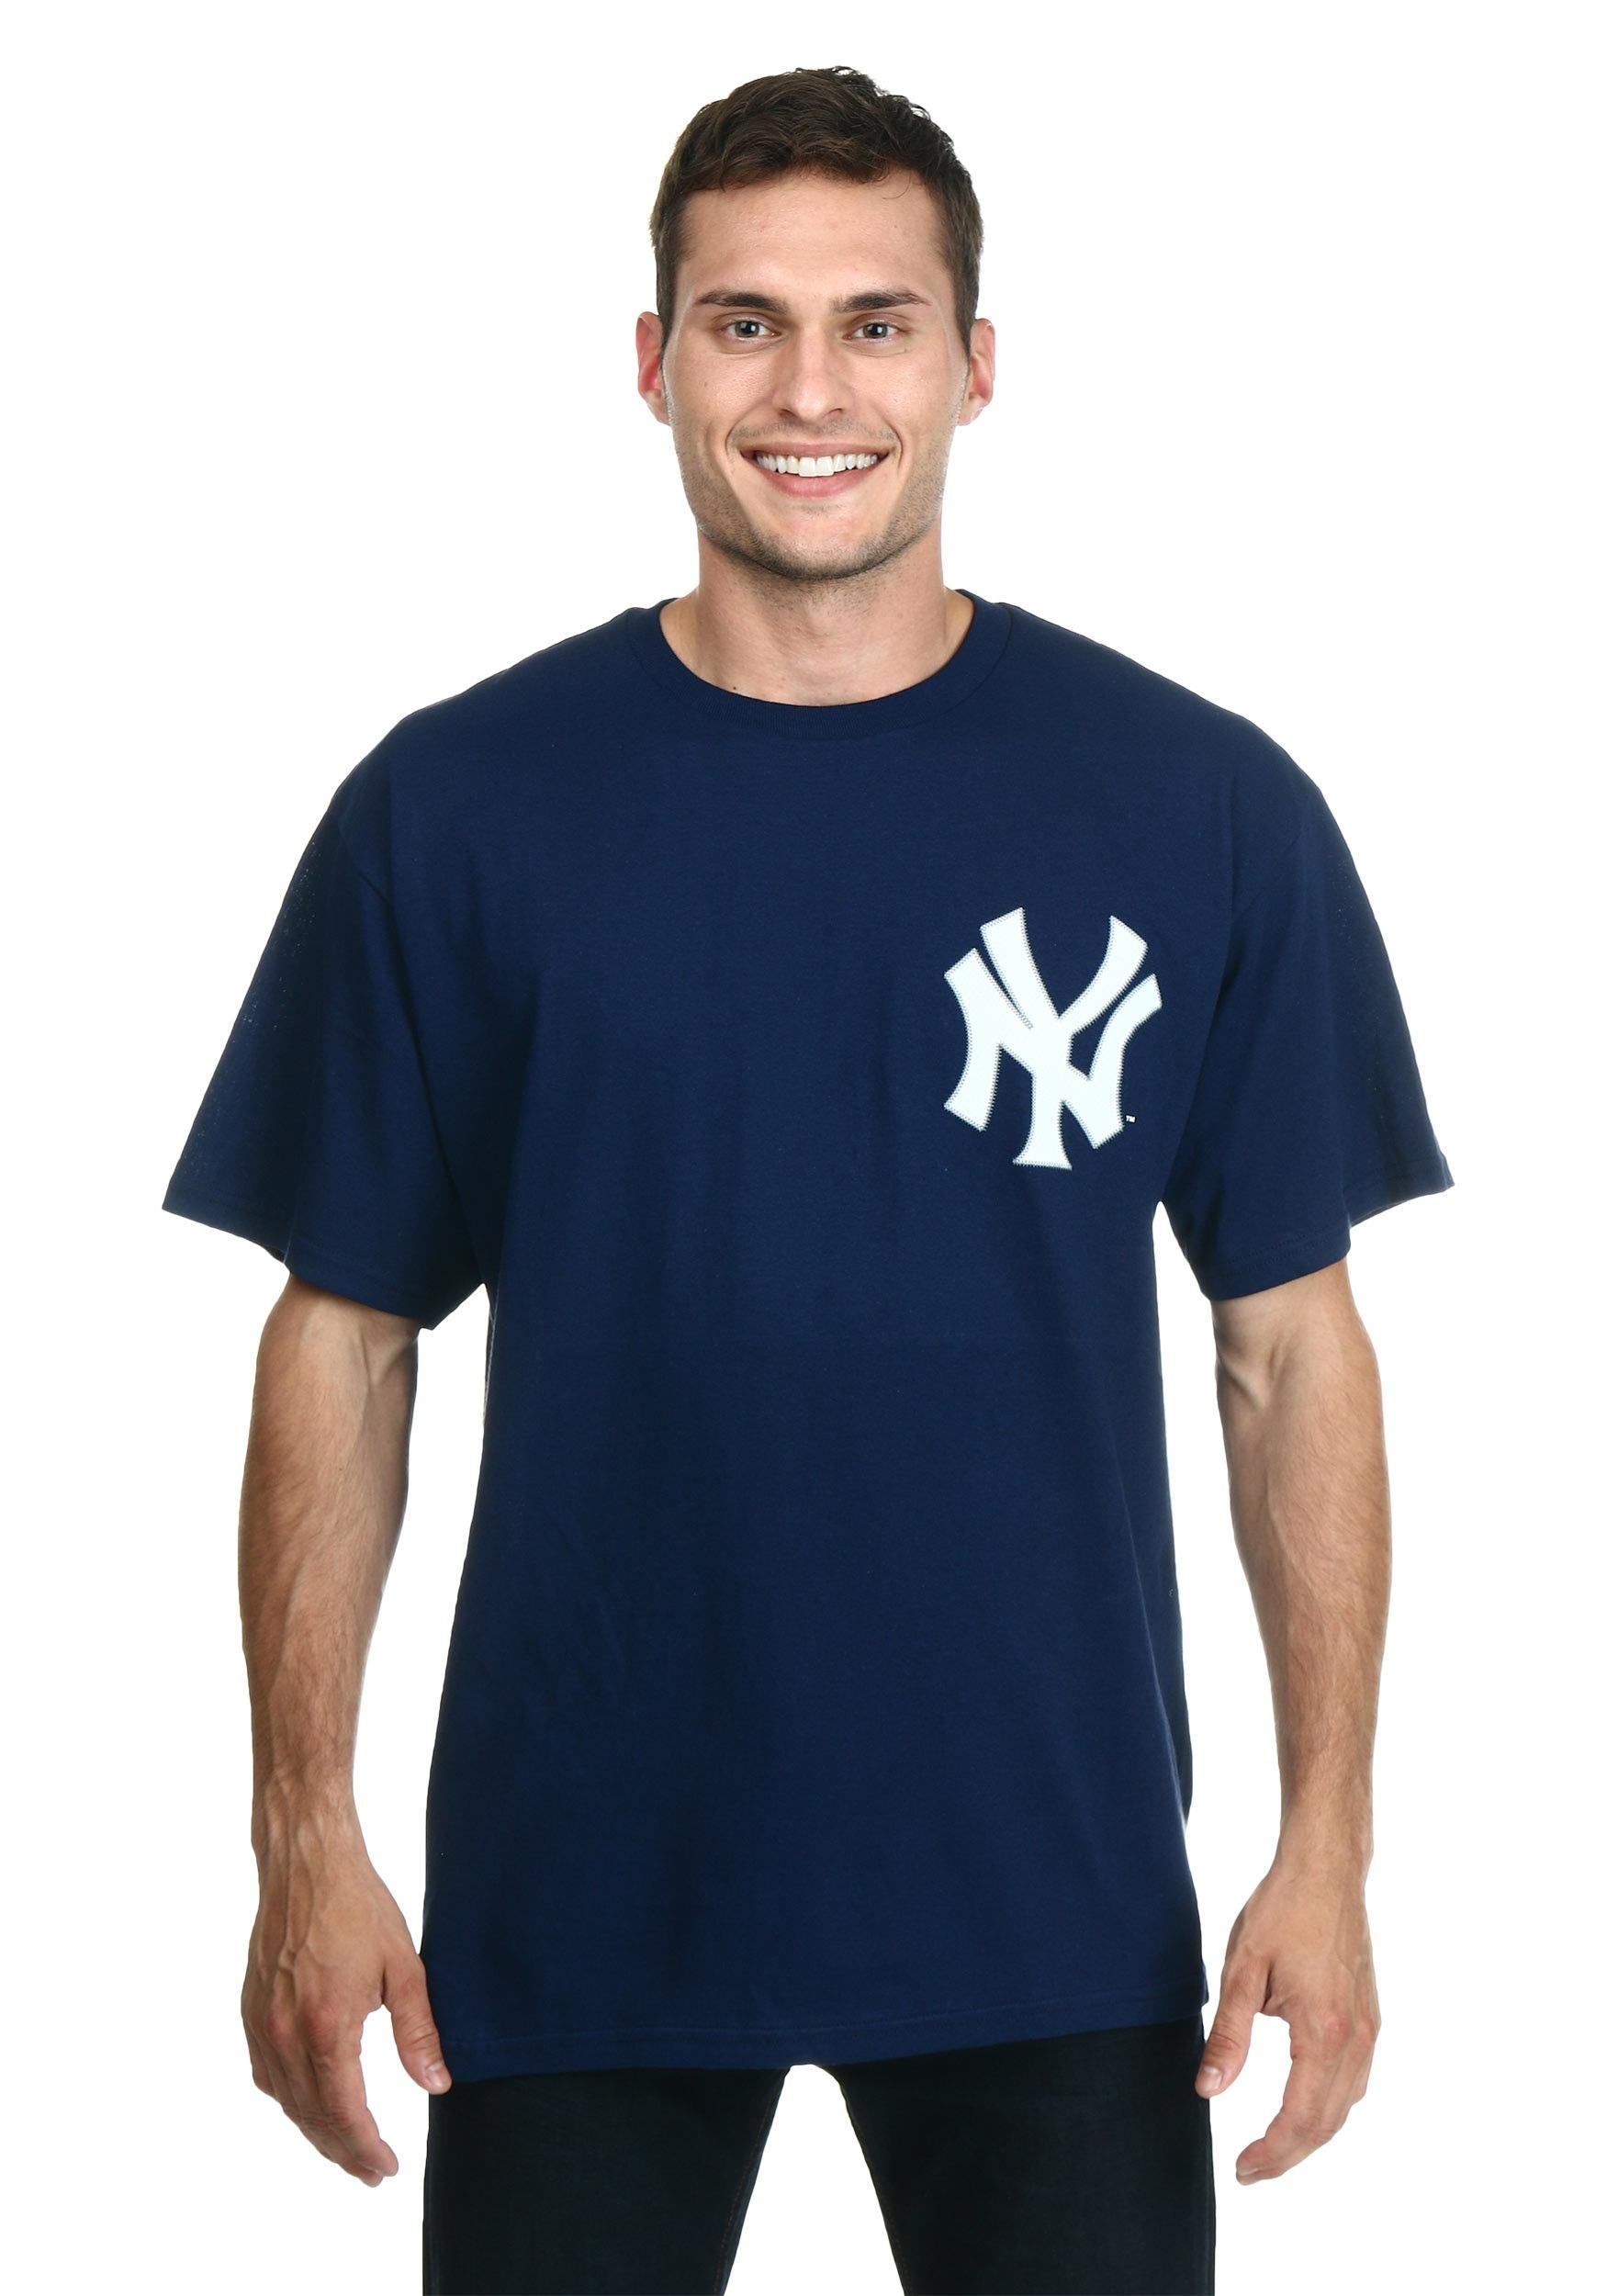 Official Wordmark New York Yankees Men s T-Shirt 1fab54b36ed